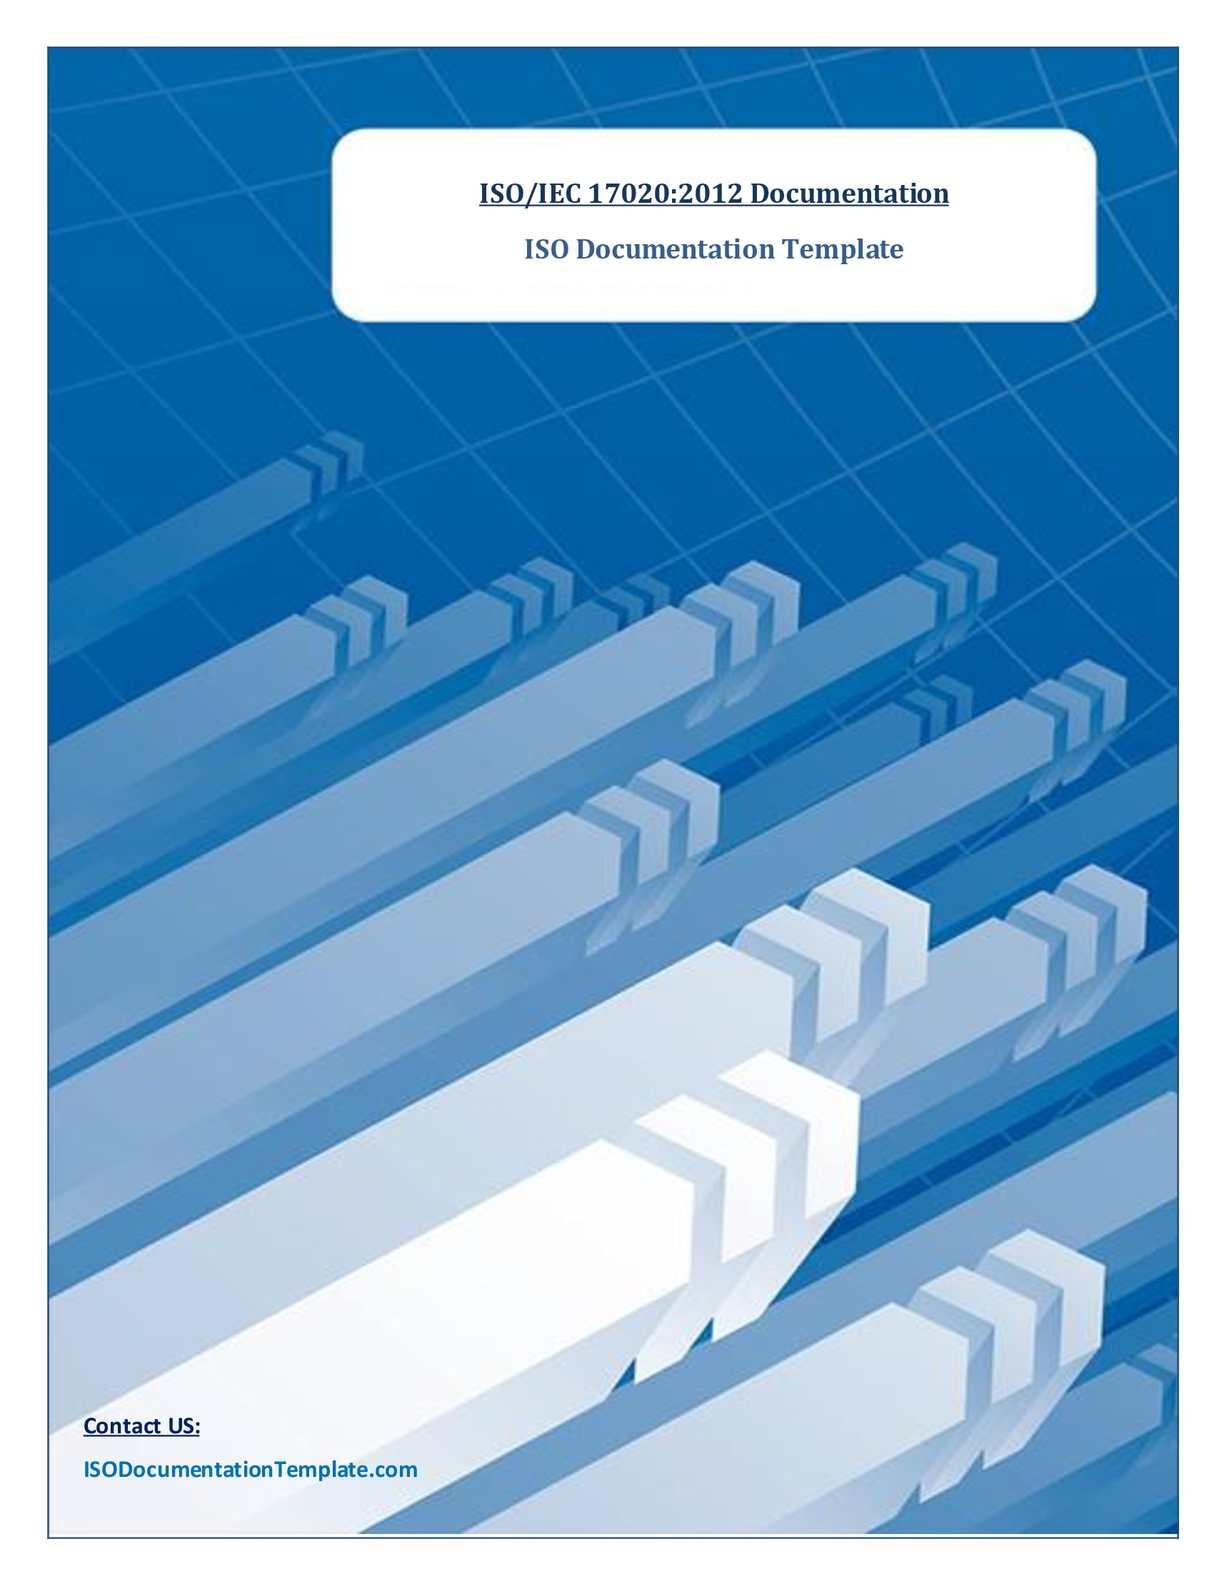 Calaméo - ISO/IEC 17020:2012 Documentation